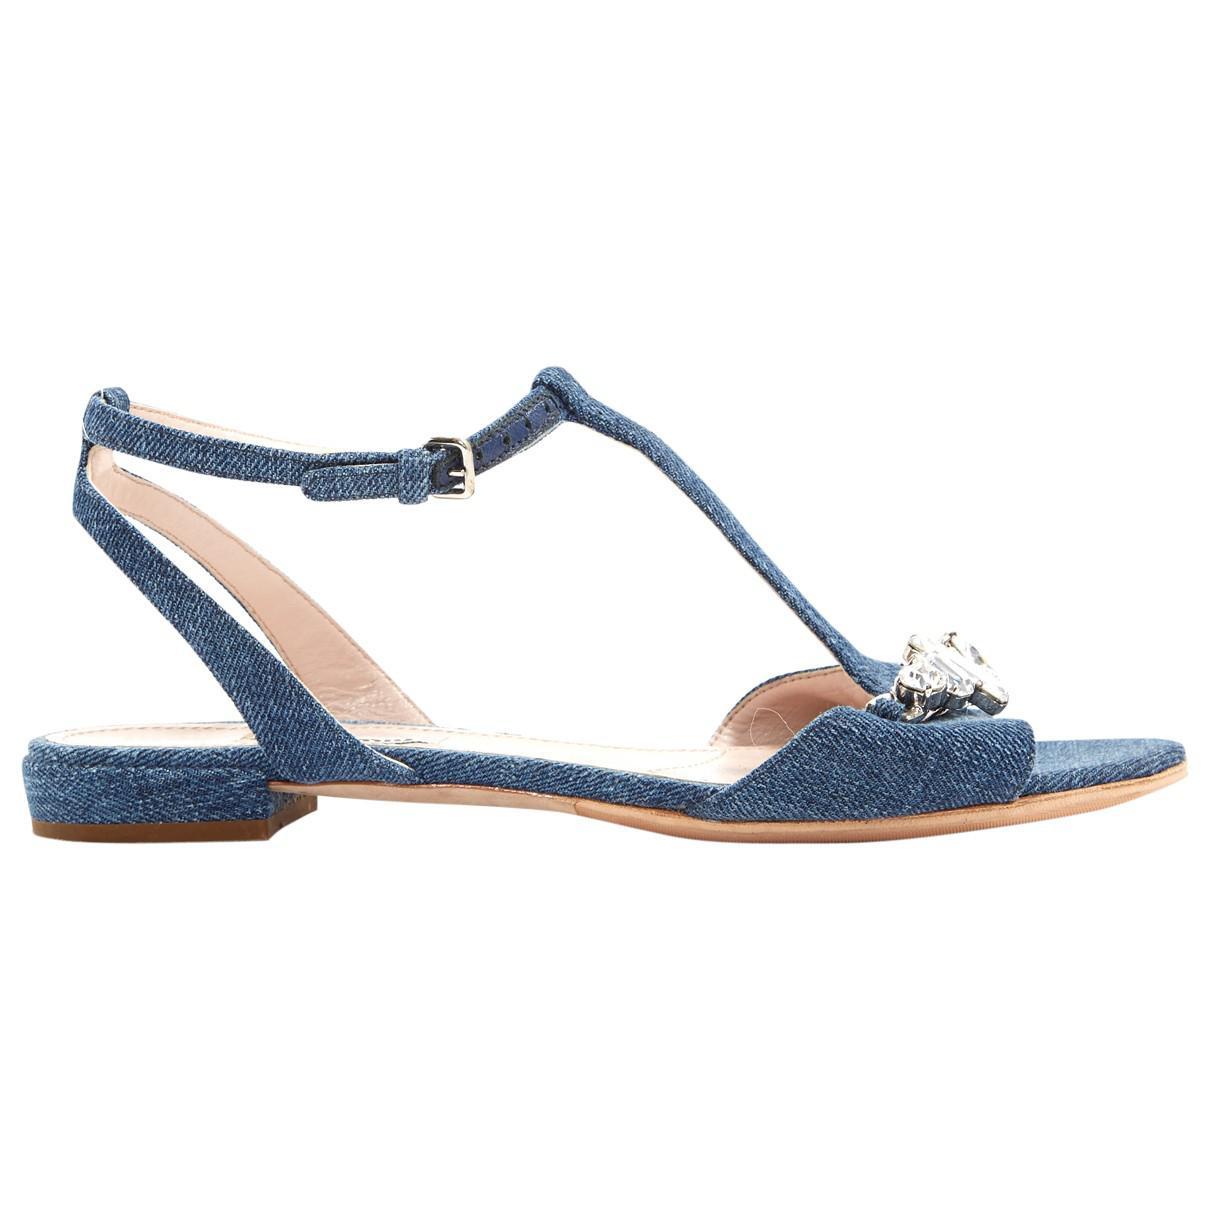 Pre-owned - Cloth sandal Miu Miu YgQU7Aik1